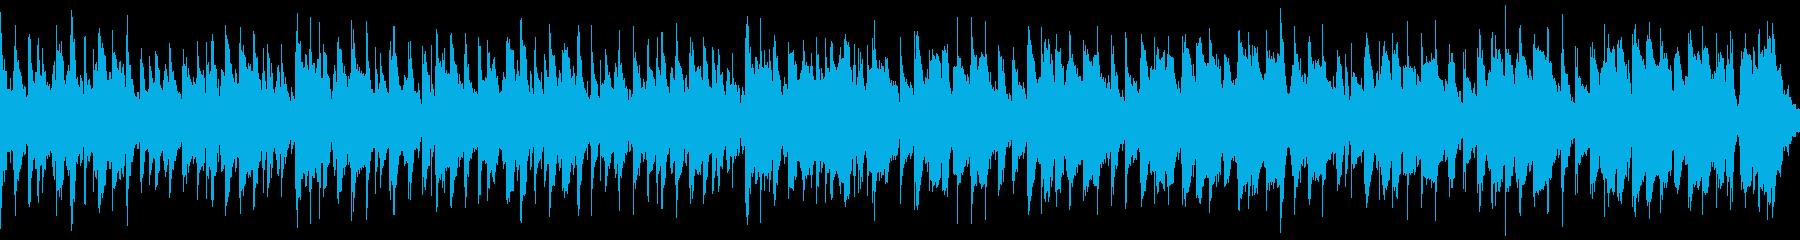 CM用13/ループ、陽気なキッズ向けの再生済みの波形